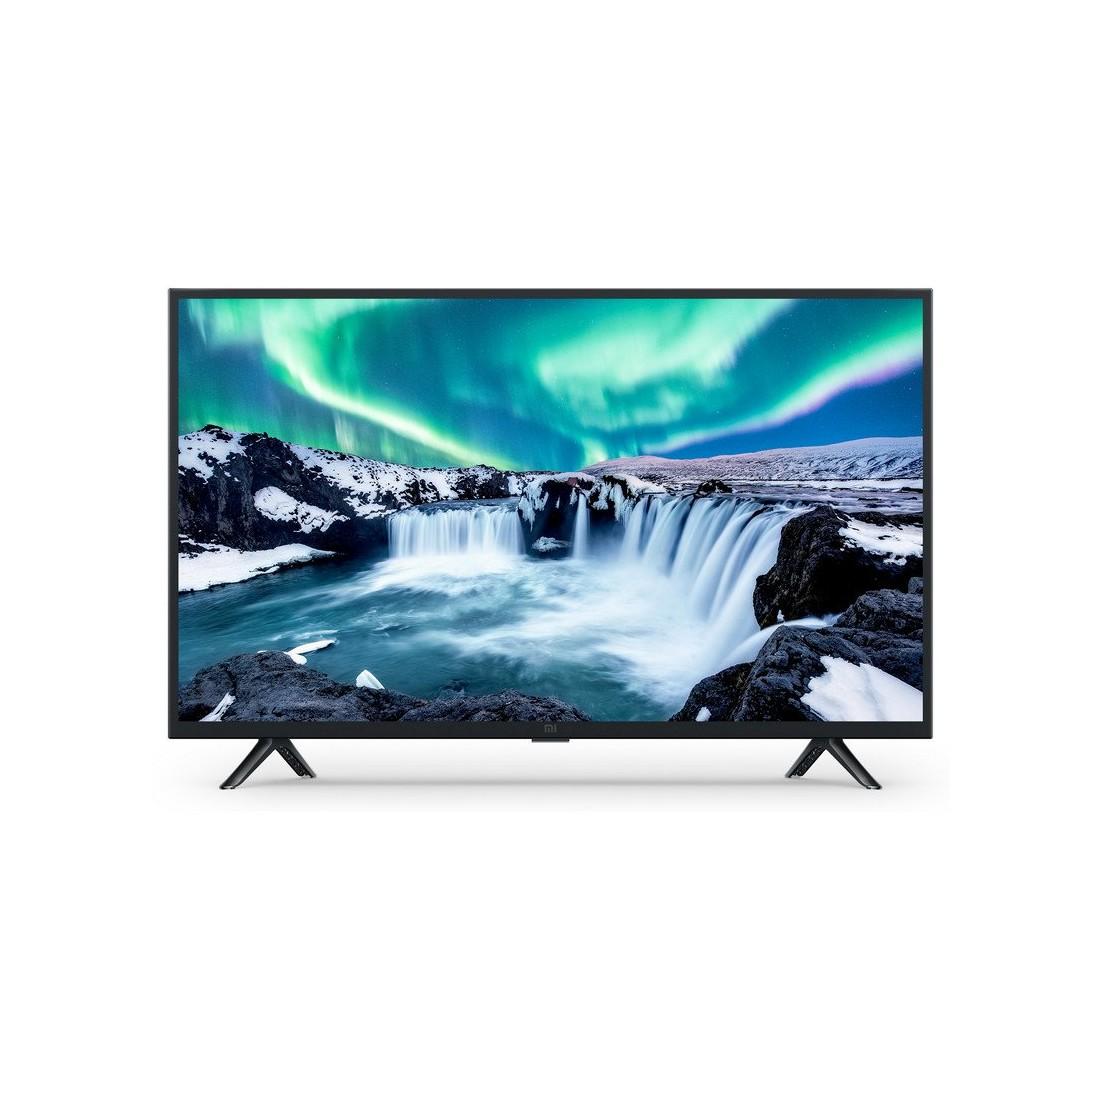 "Xiaomi Mi LED TV 4A V52R 32"" HD Smart TV Android OS"